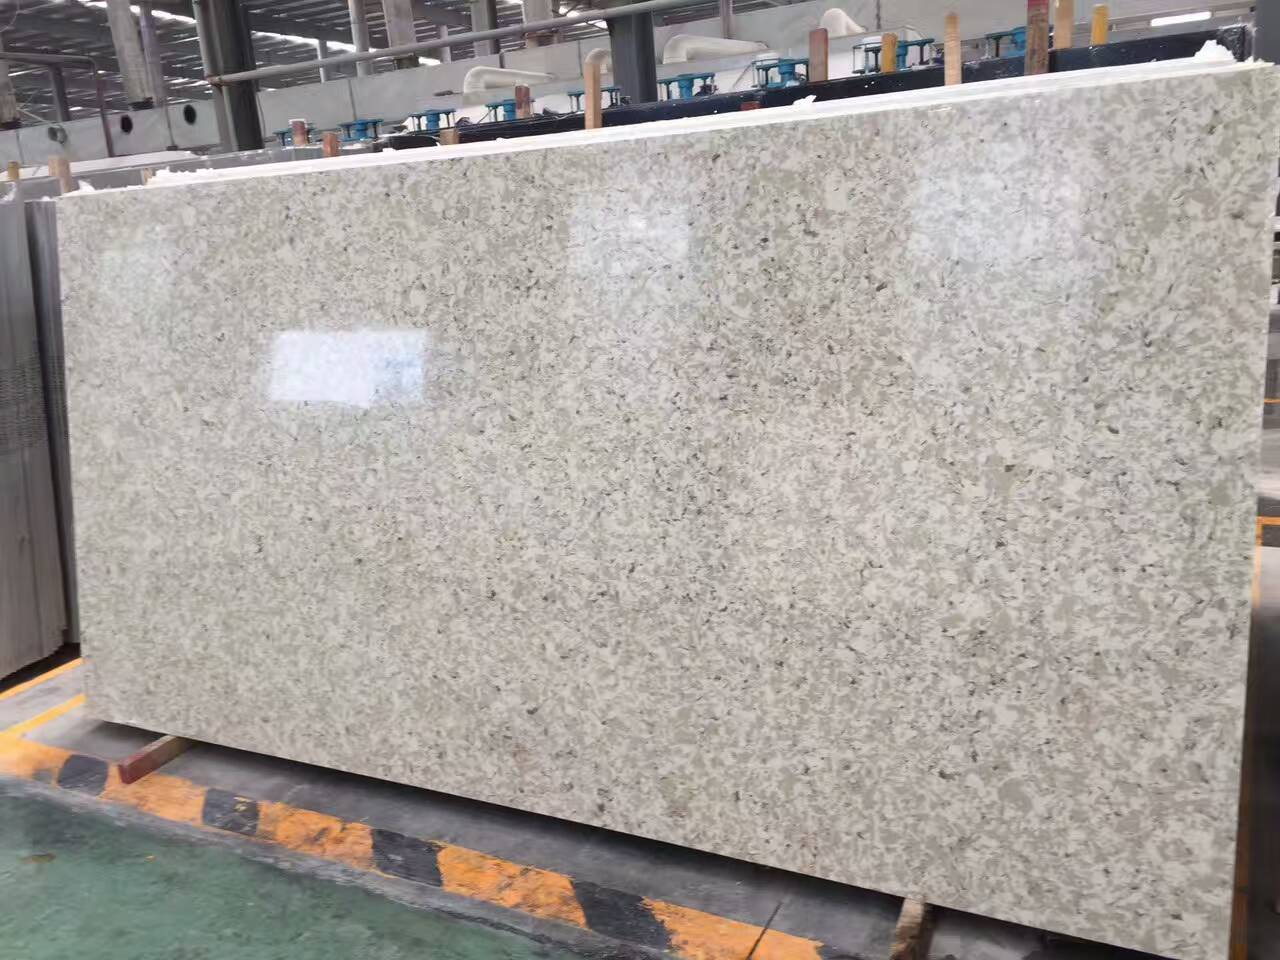 Artificial Sparkle Quartz Slabs for Countertops